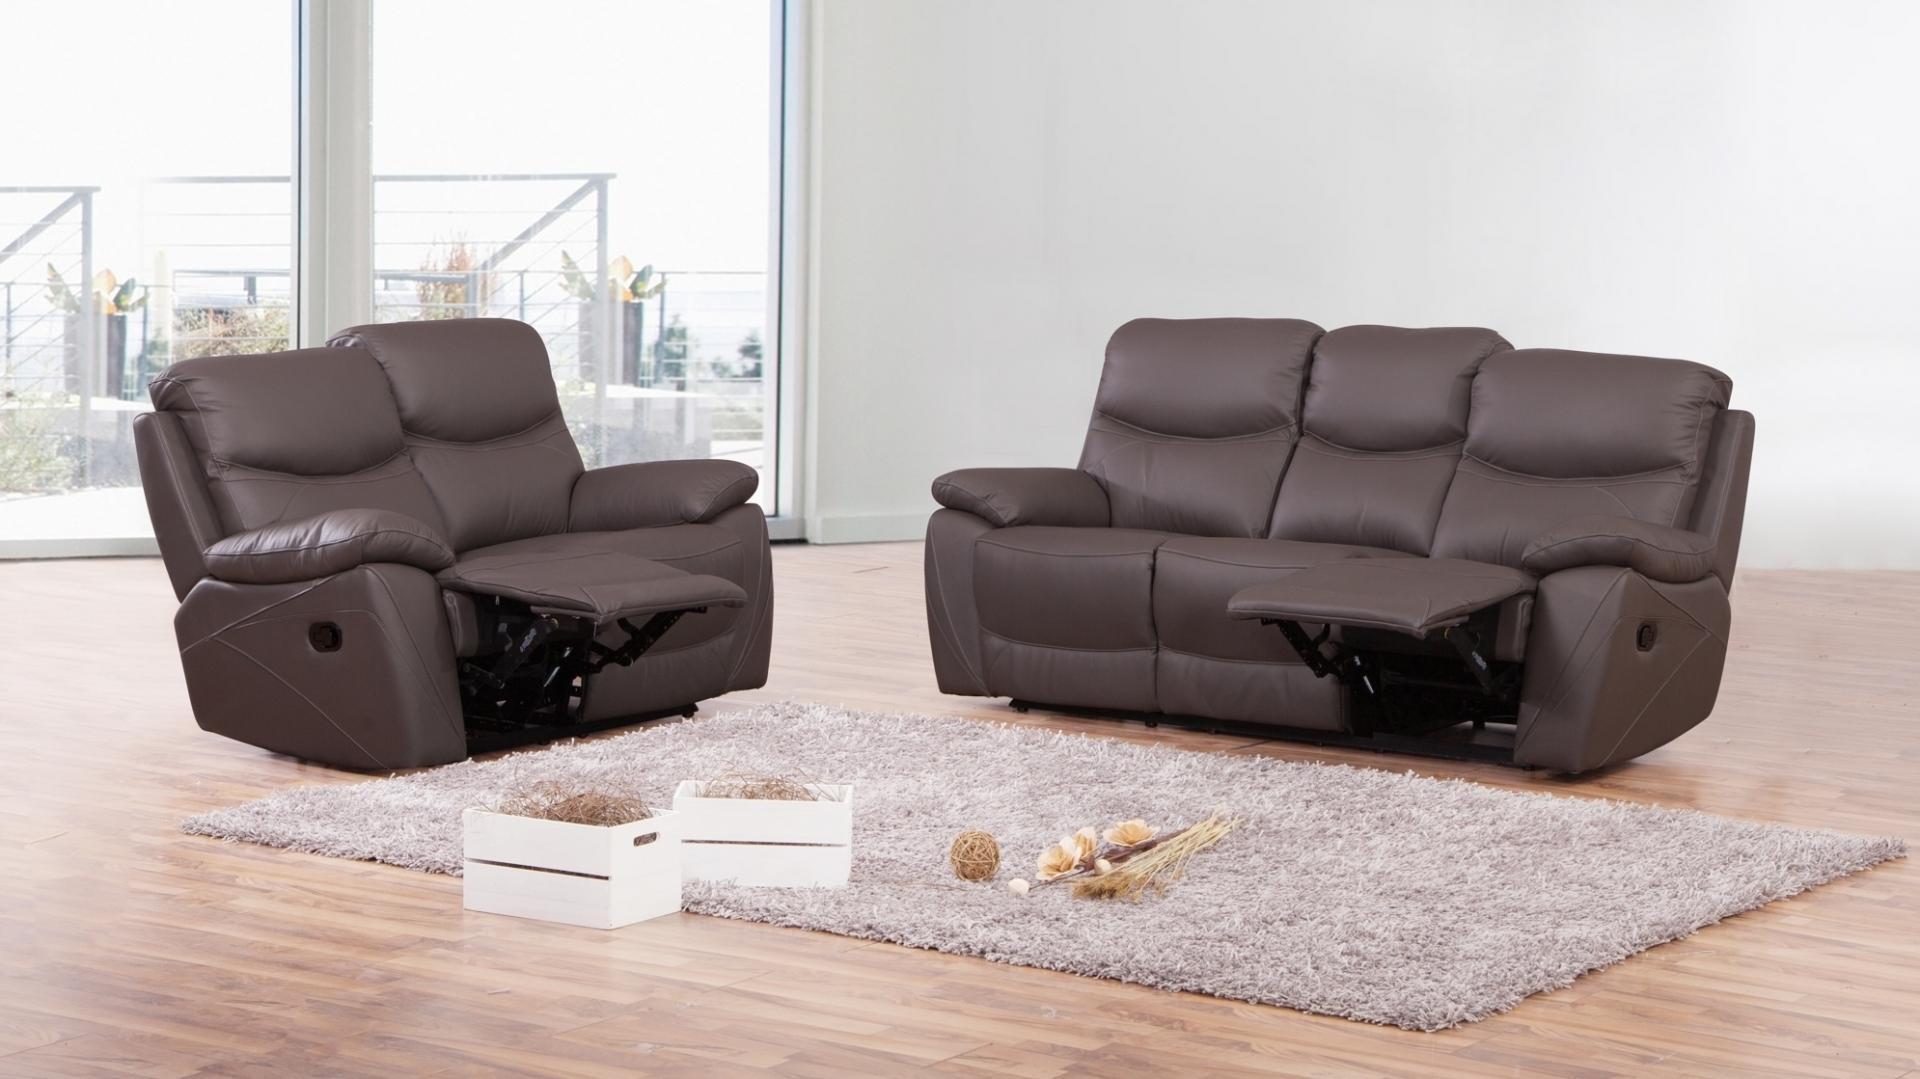 chelsea leather sofa harrison sofascore recliner suite 3 43 2 lounge life